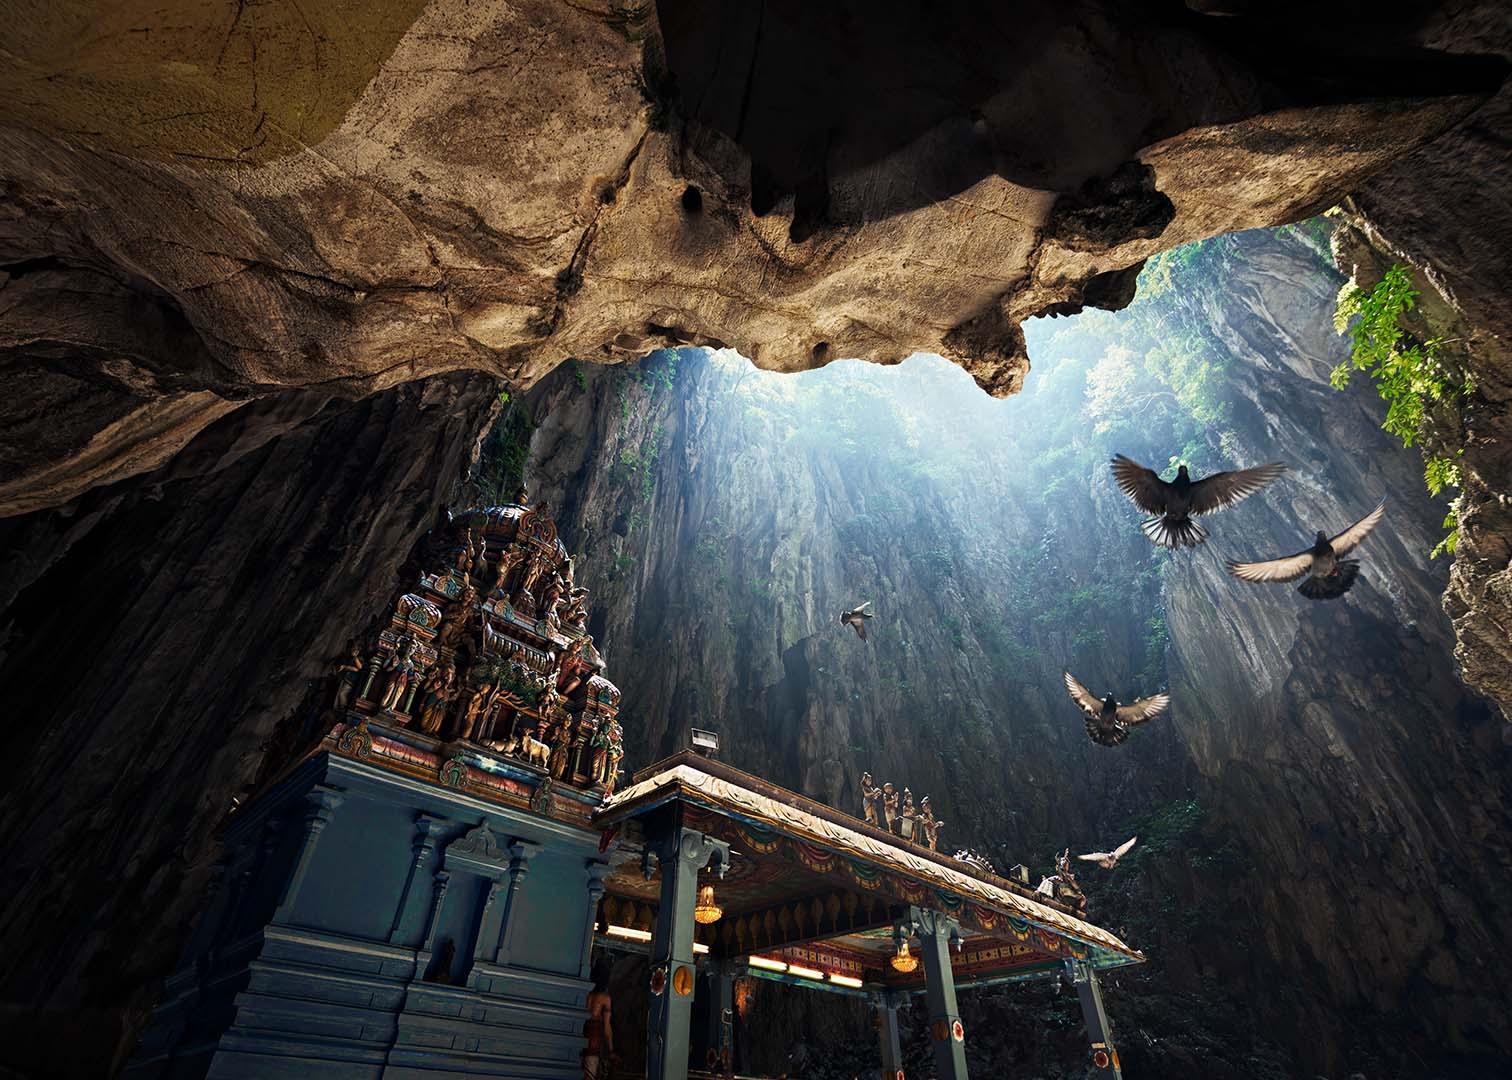 Картинки по запросу Пещеры Бату, Малайзия